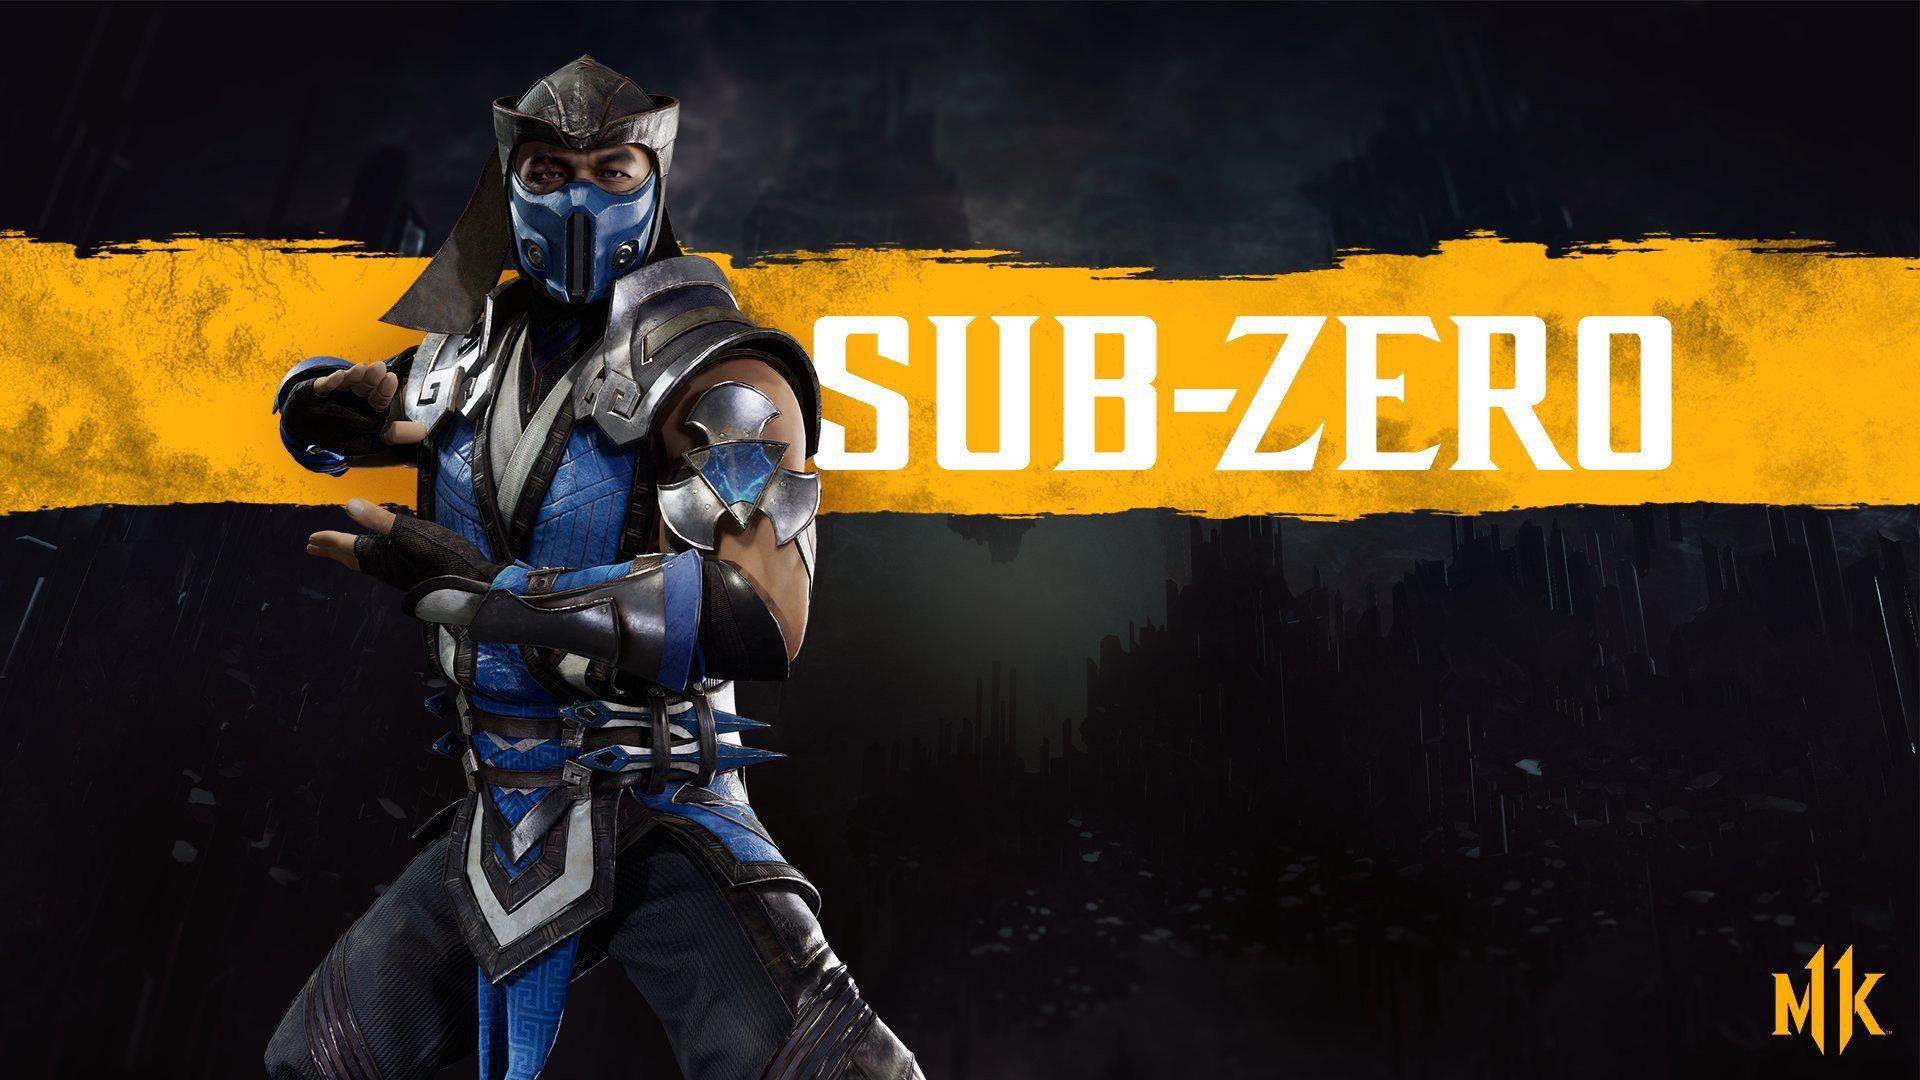 General 1920x1080 Mortal Kombat 11 video games Video Game Warriors Sub-Zero